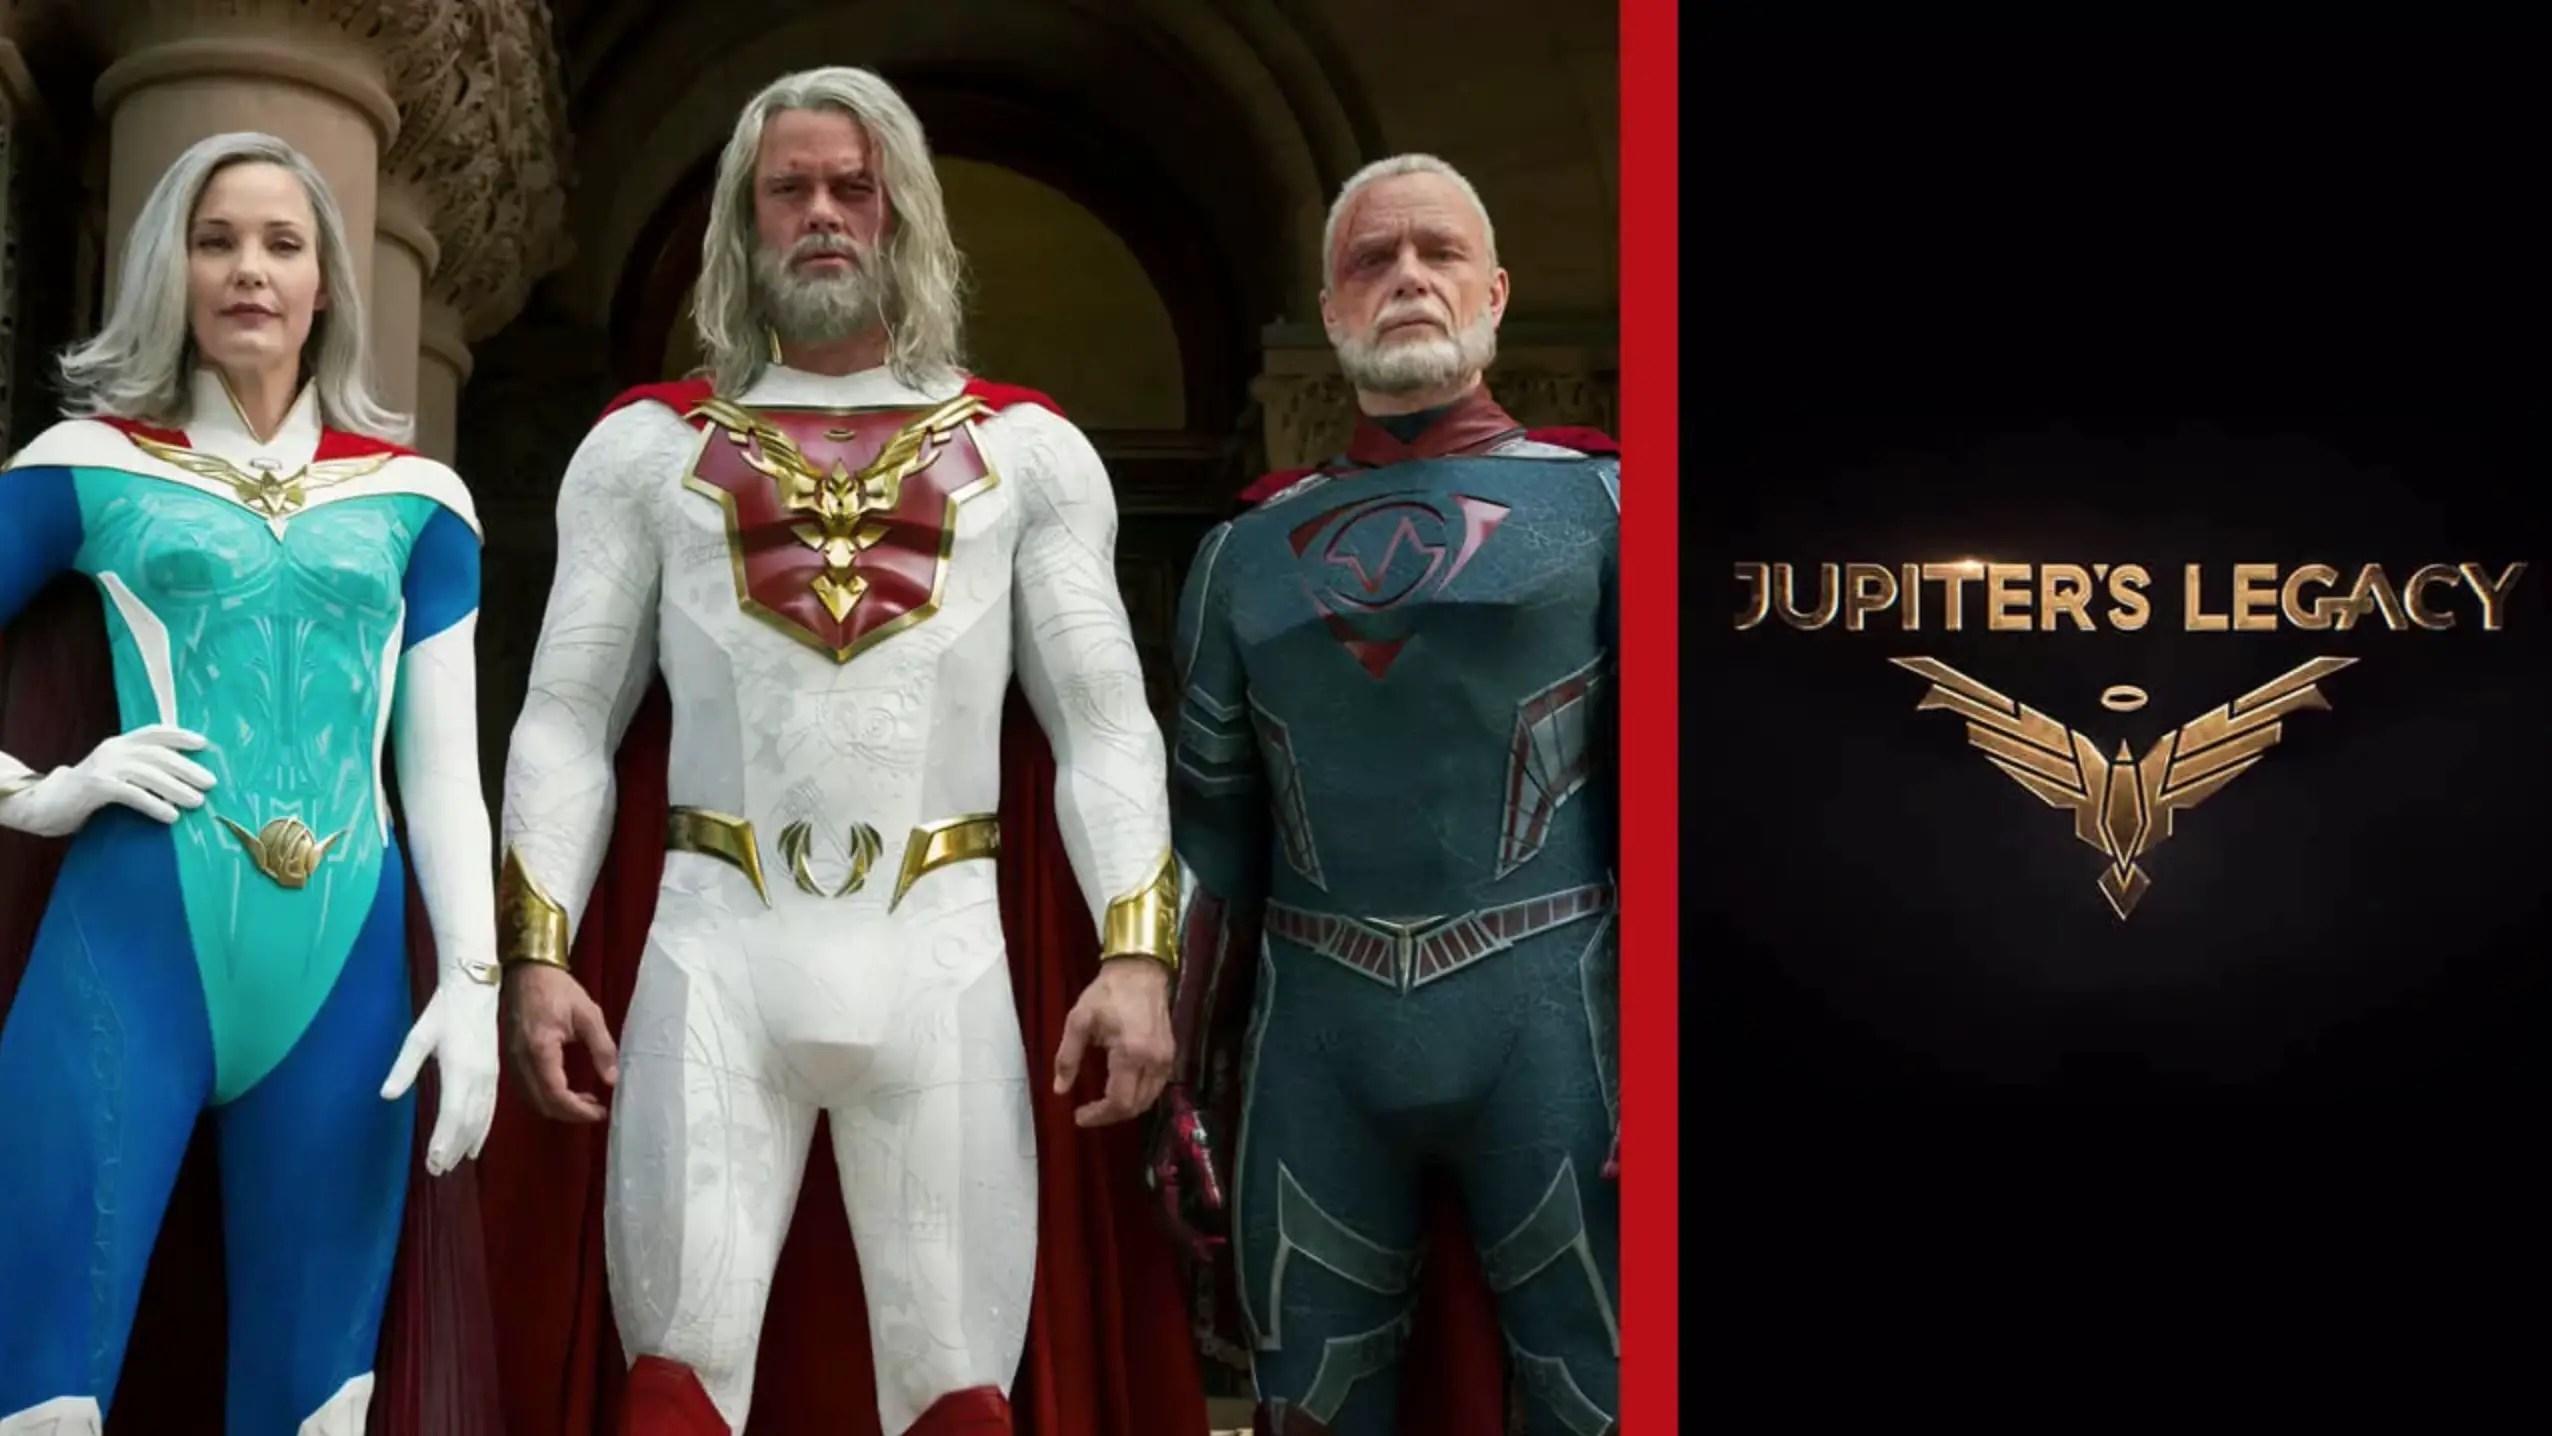 'Jupiter's Legacy' season 1 is superhero storytelling at new heights